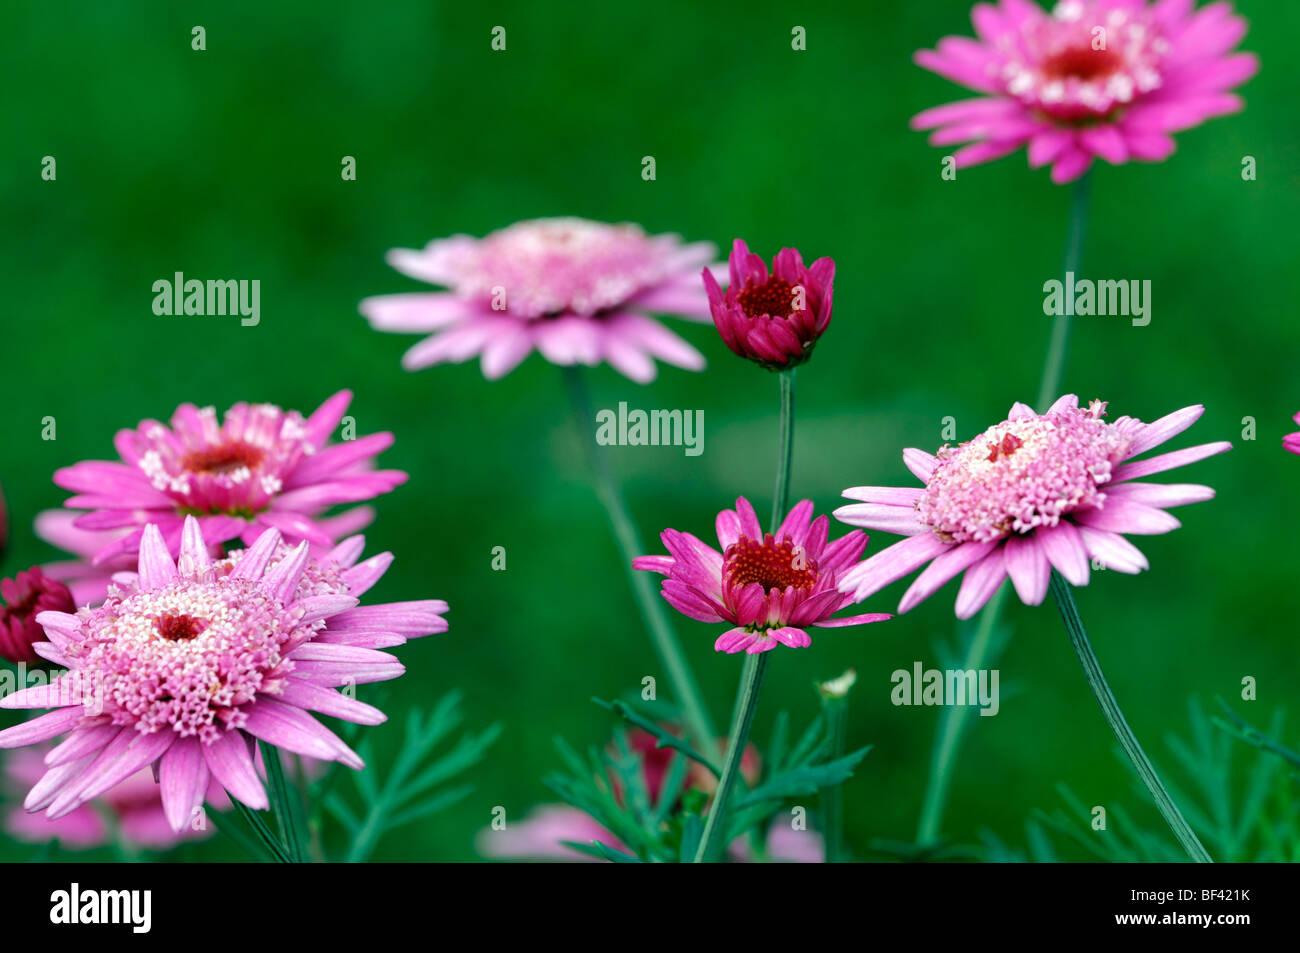 Pink Argyranthemum Flower Daisy Daisies Bloom Stock Photos Pink